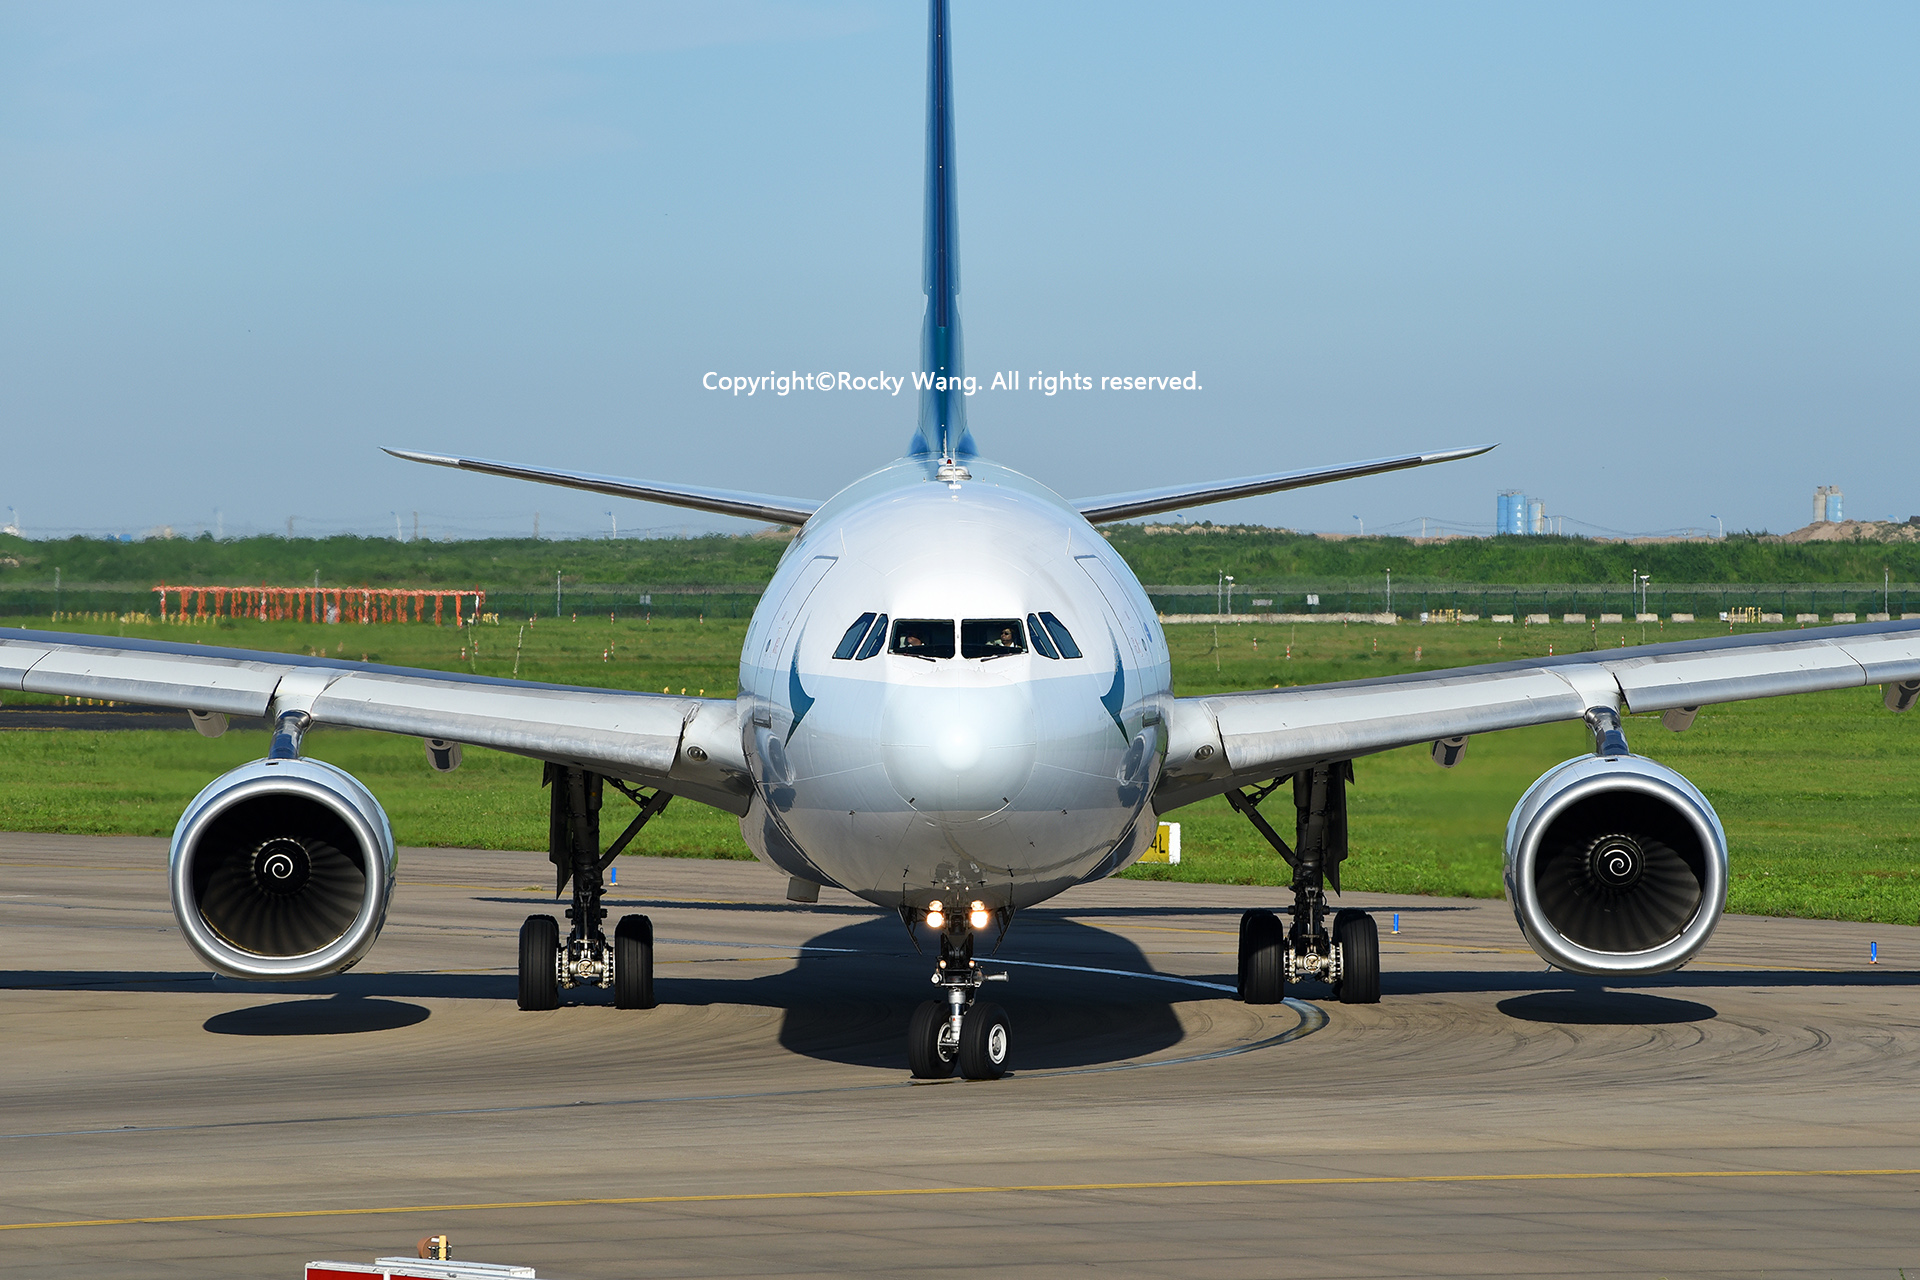 Re:[原创]盗图就别狂 发组表情自己体会 AIRBUS A330-343 B-HLM Shanghai Pudong